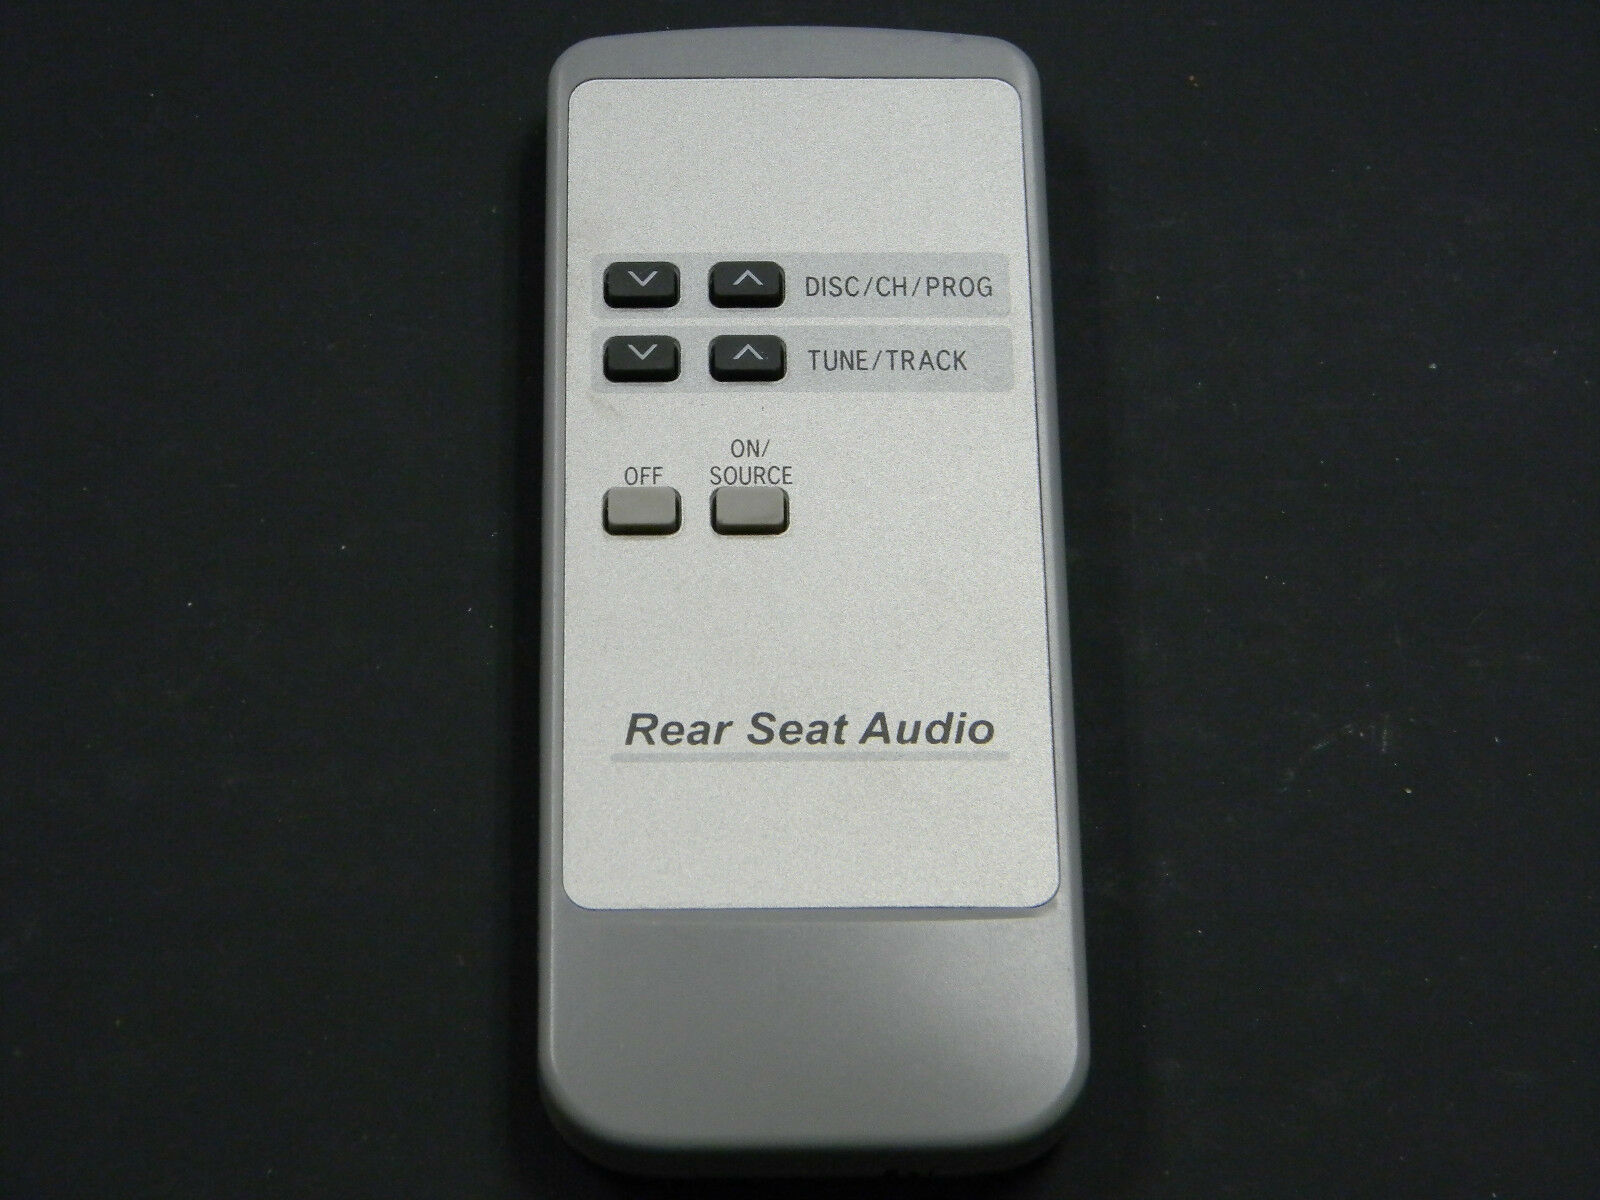 TOYOTA LEXUS REAR DVD Entertainment Remote Control REAR SEAT OEM 86170-34010